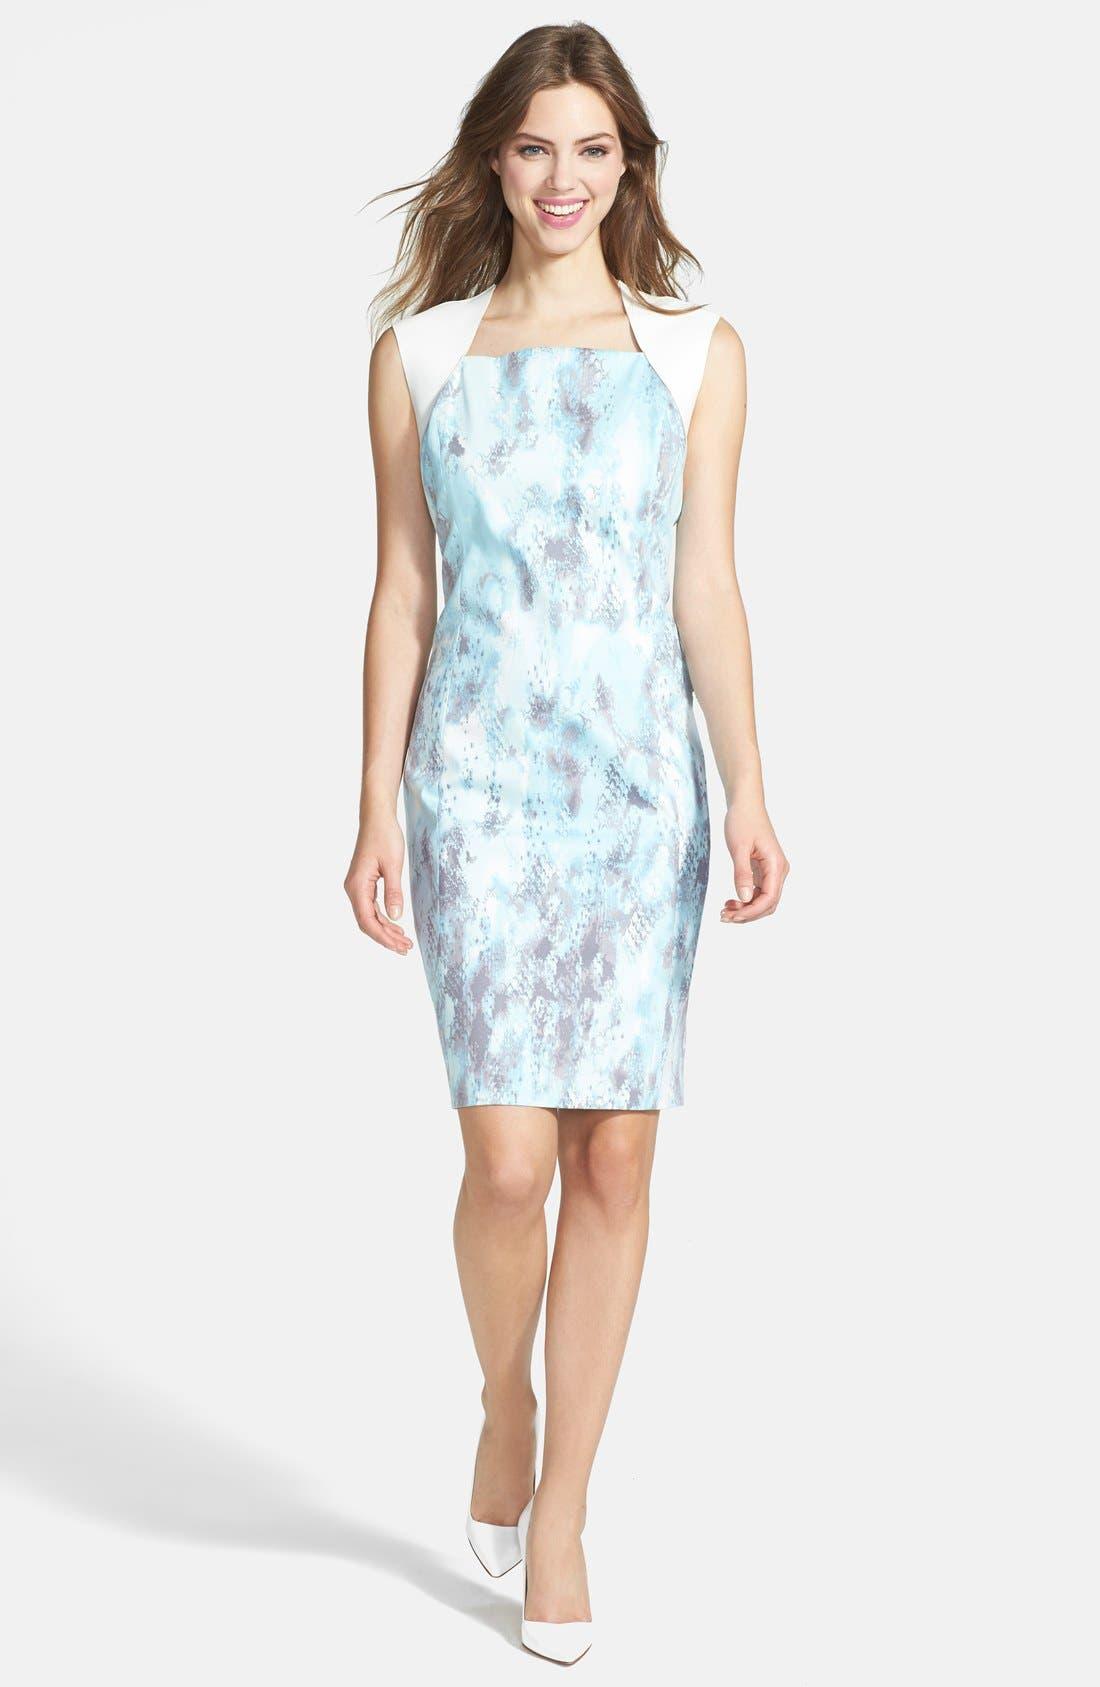 Main Image - T Tahari 'Moxie' Dress